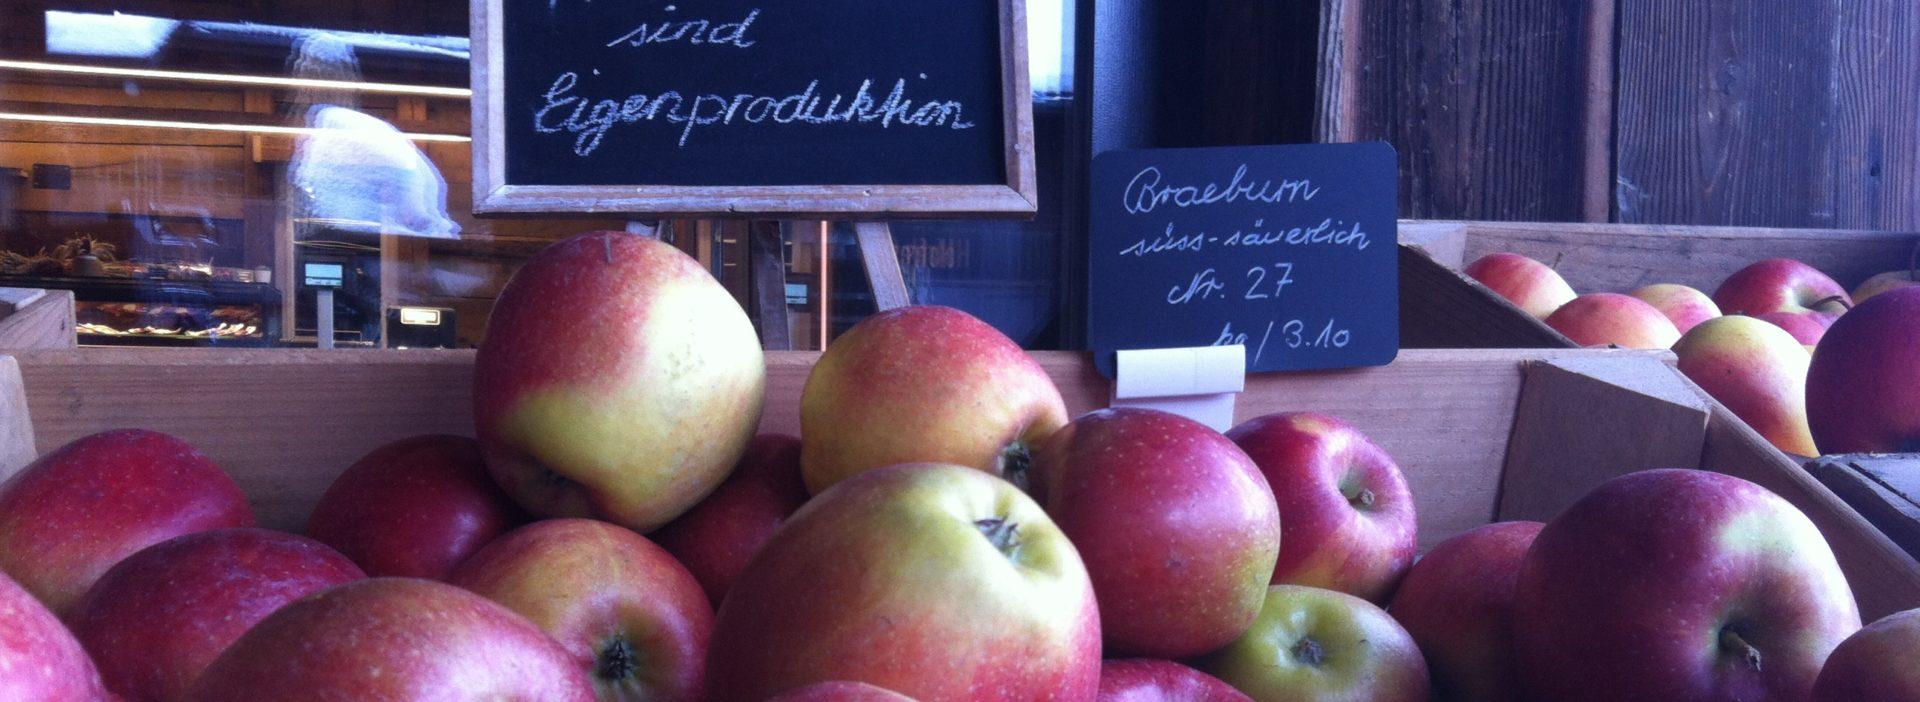 Apfel Hofladen Braeburn